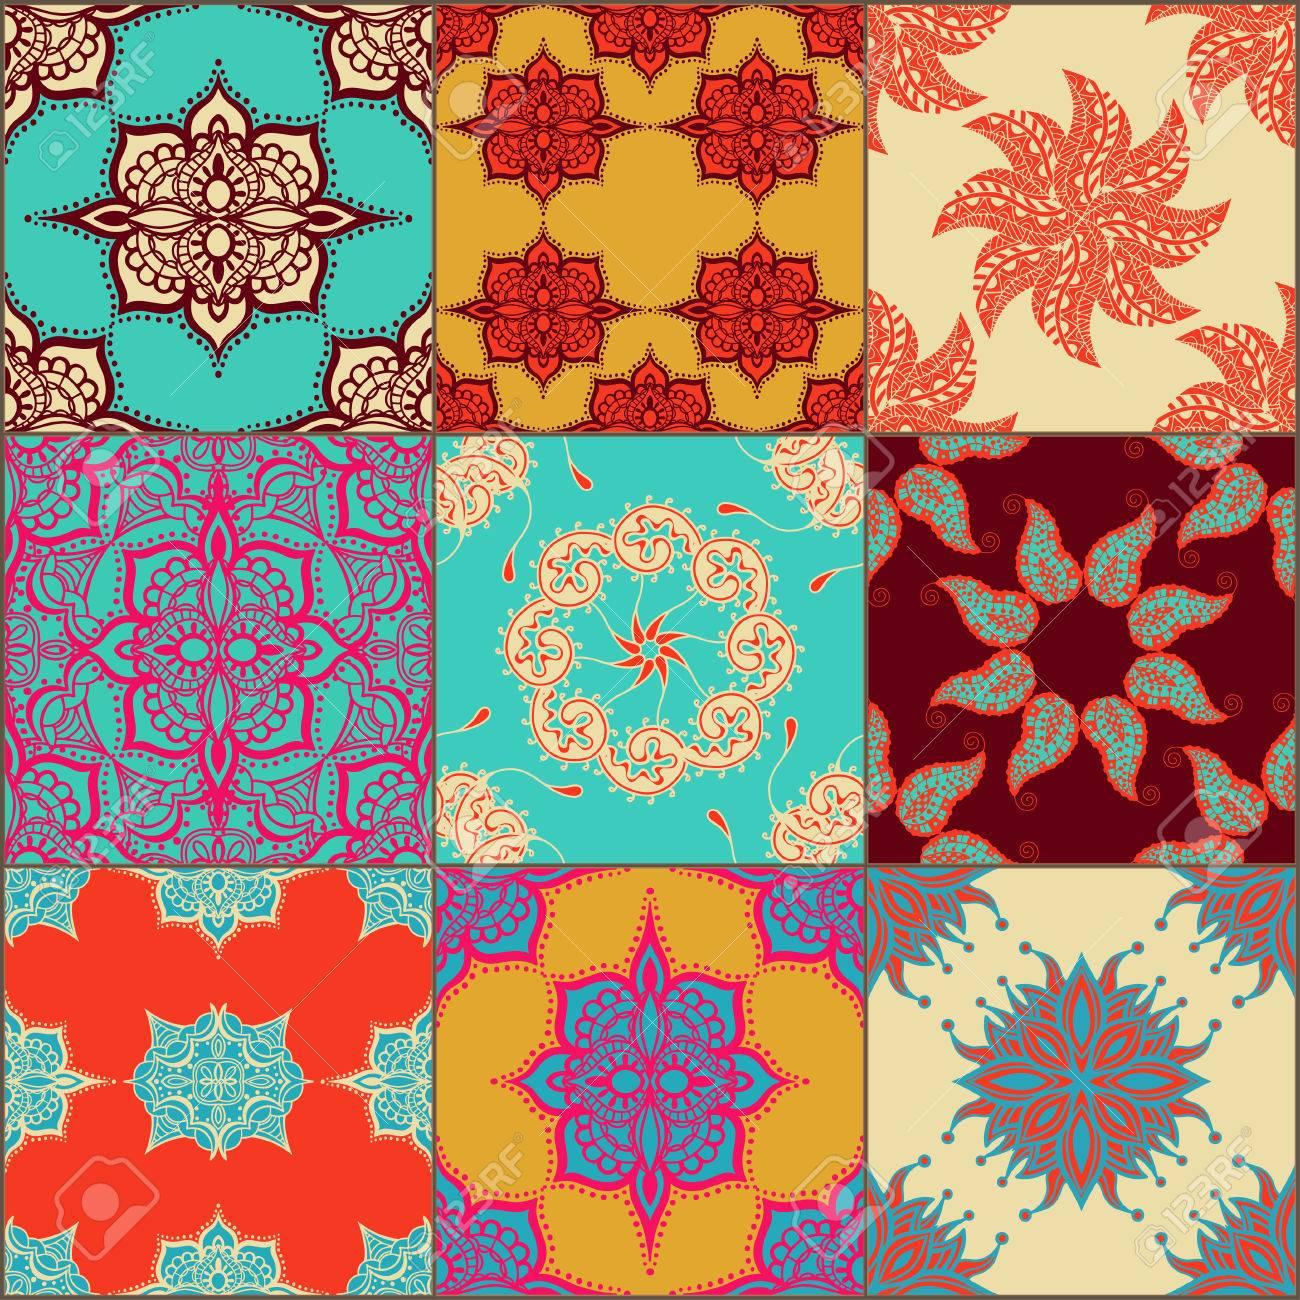 Glazed ceramic tiles set colorful vintage tiles with floral glazed ceramic tiles set colorful vintage tiles with floral and geometrical patterns spanish dailygadgetfo Gallery